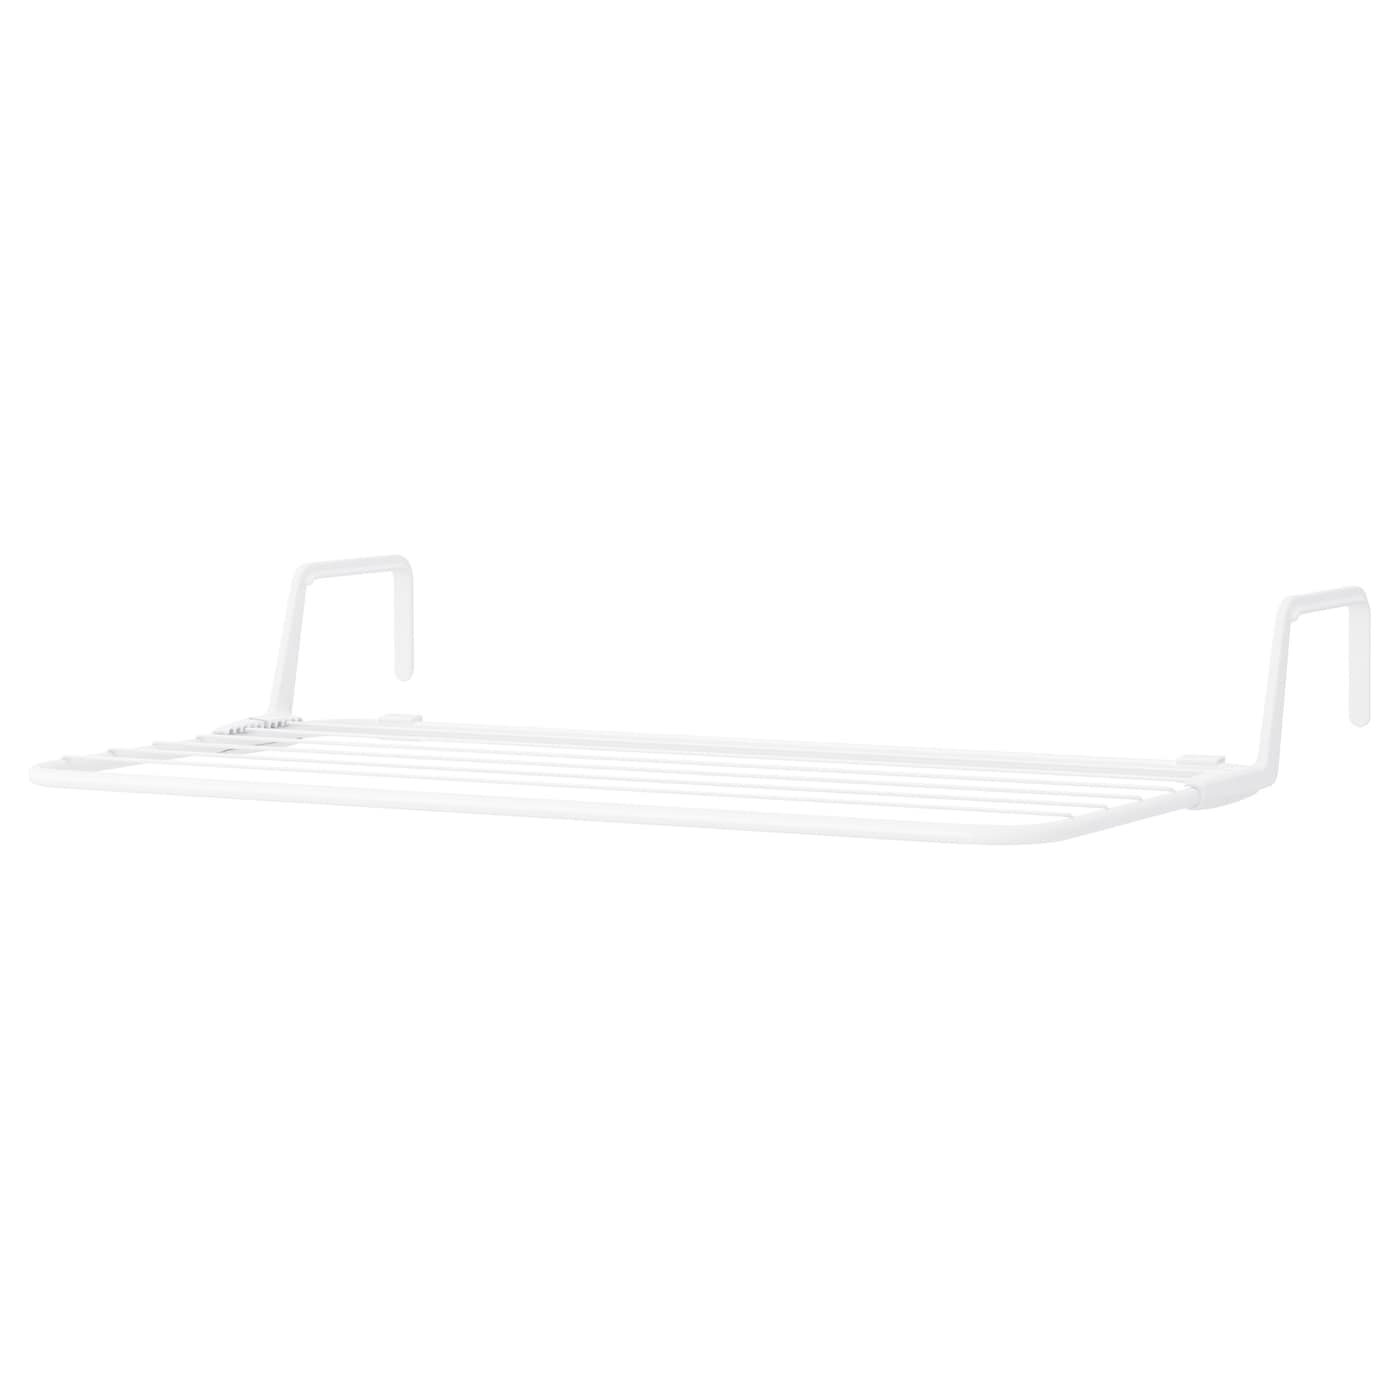 antonius s choir blanc 77 x 40 49 cm ikea. Black Bedroom Furniture Sets. Home Design Ideas